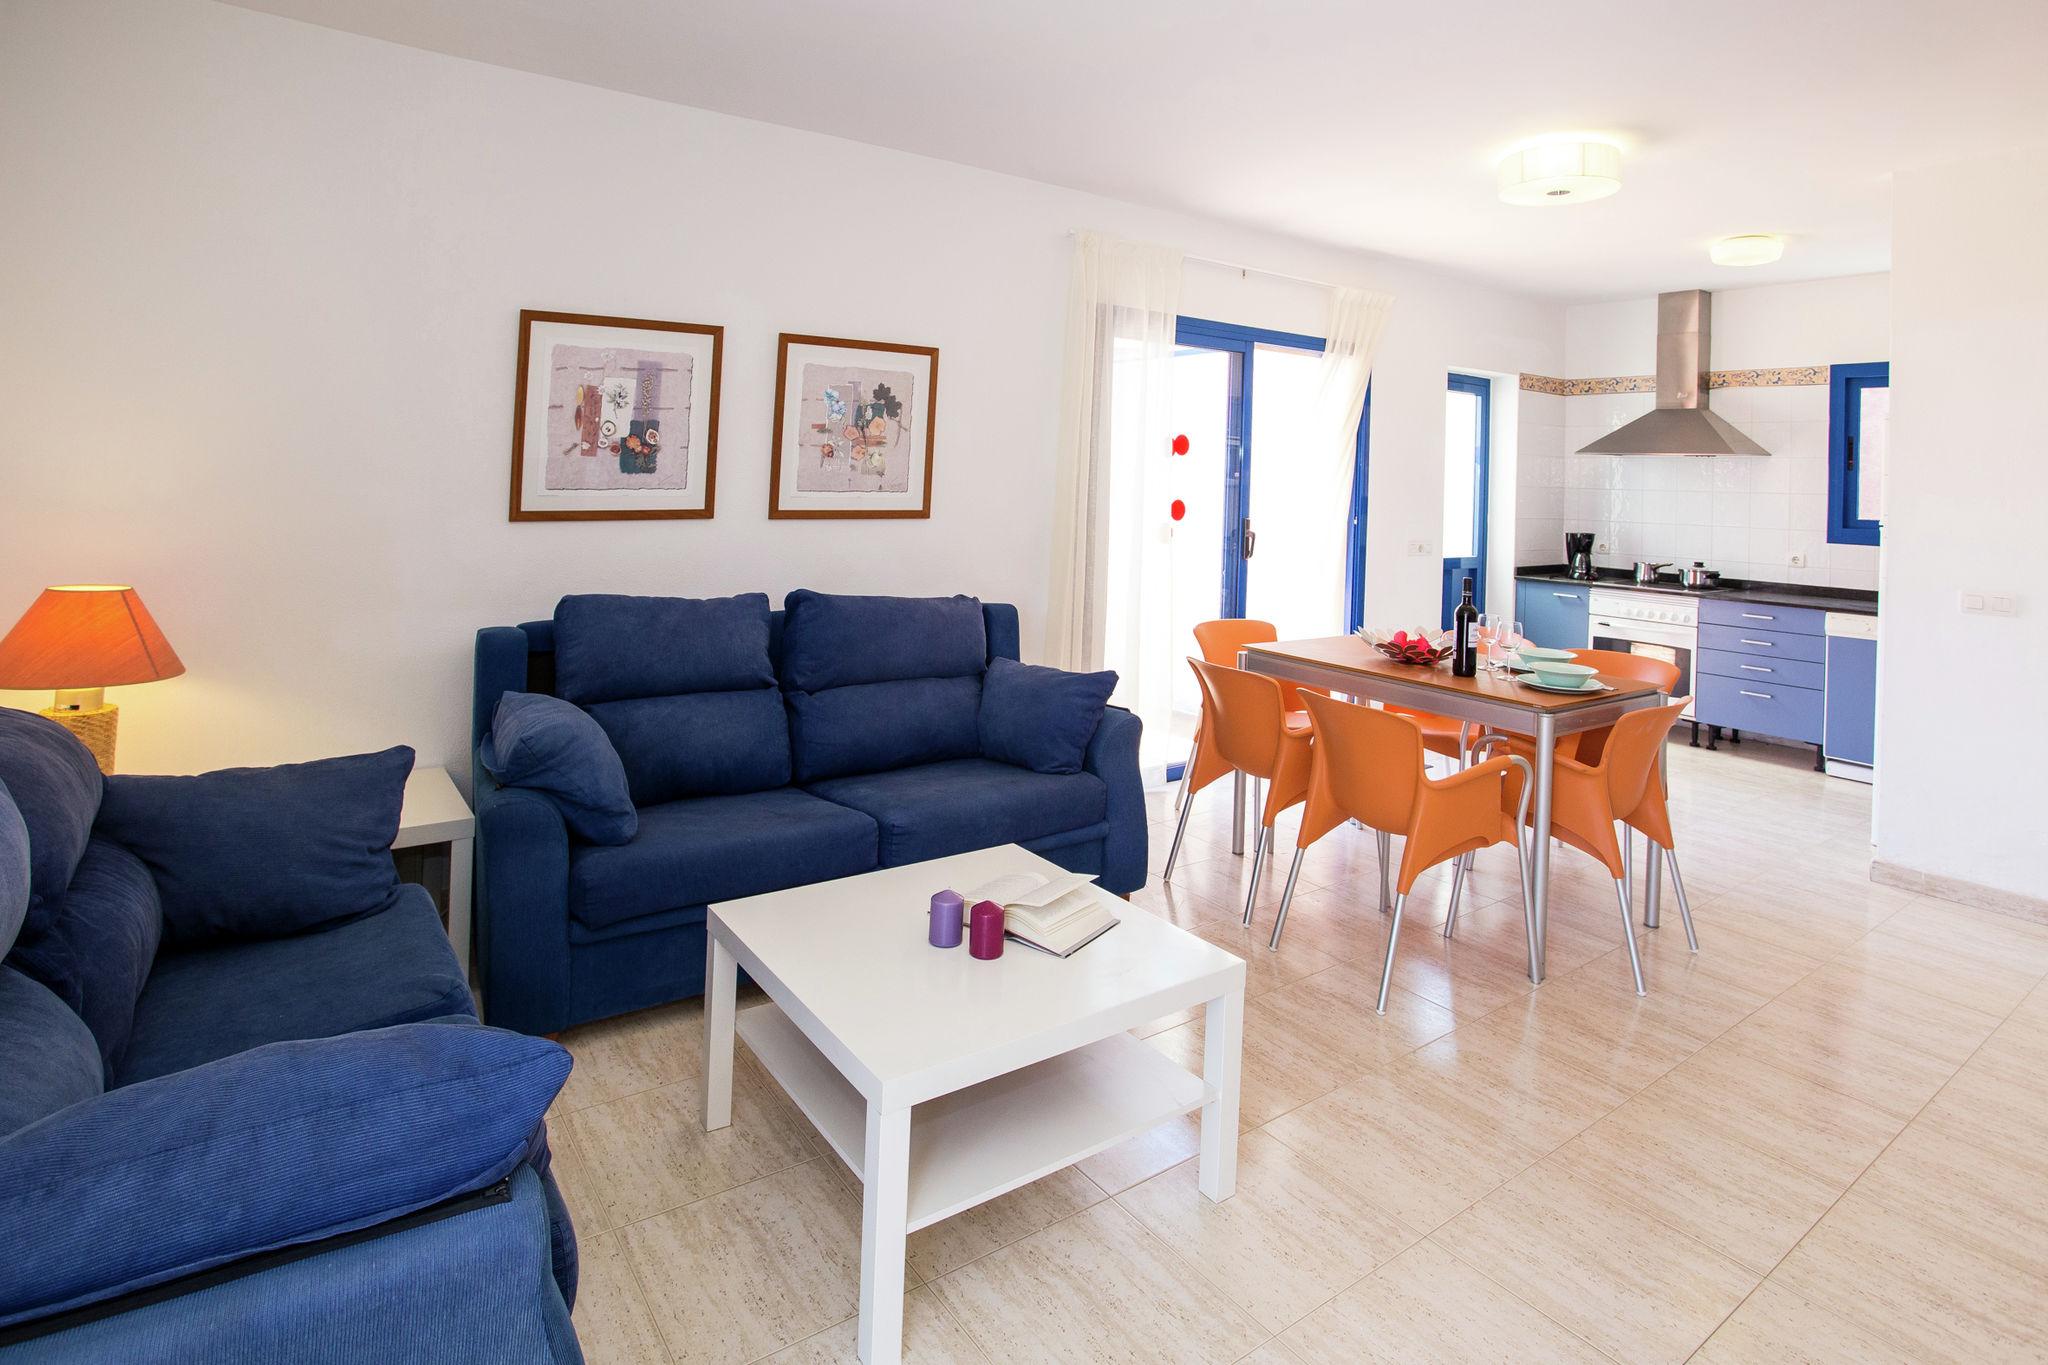 Geräumige Villa in Playa Blanca mit Swimmingpool